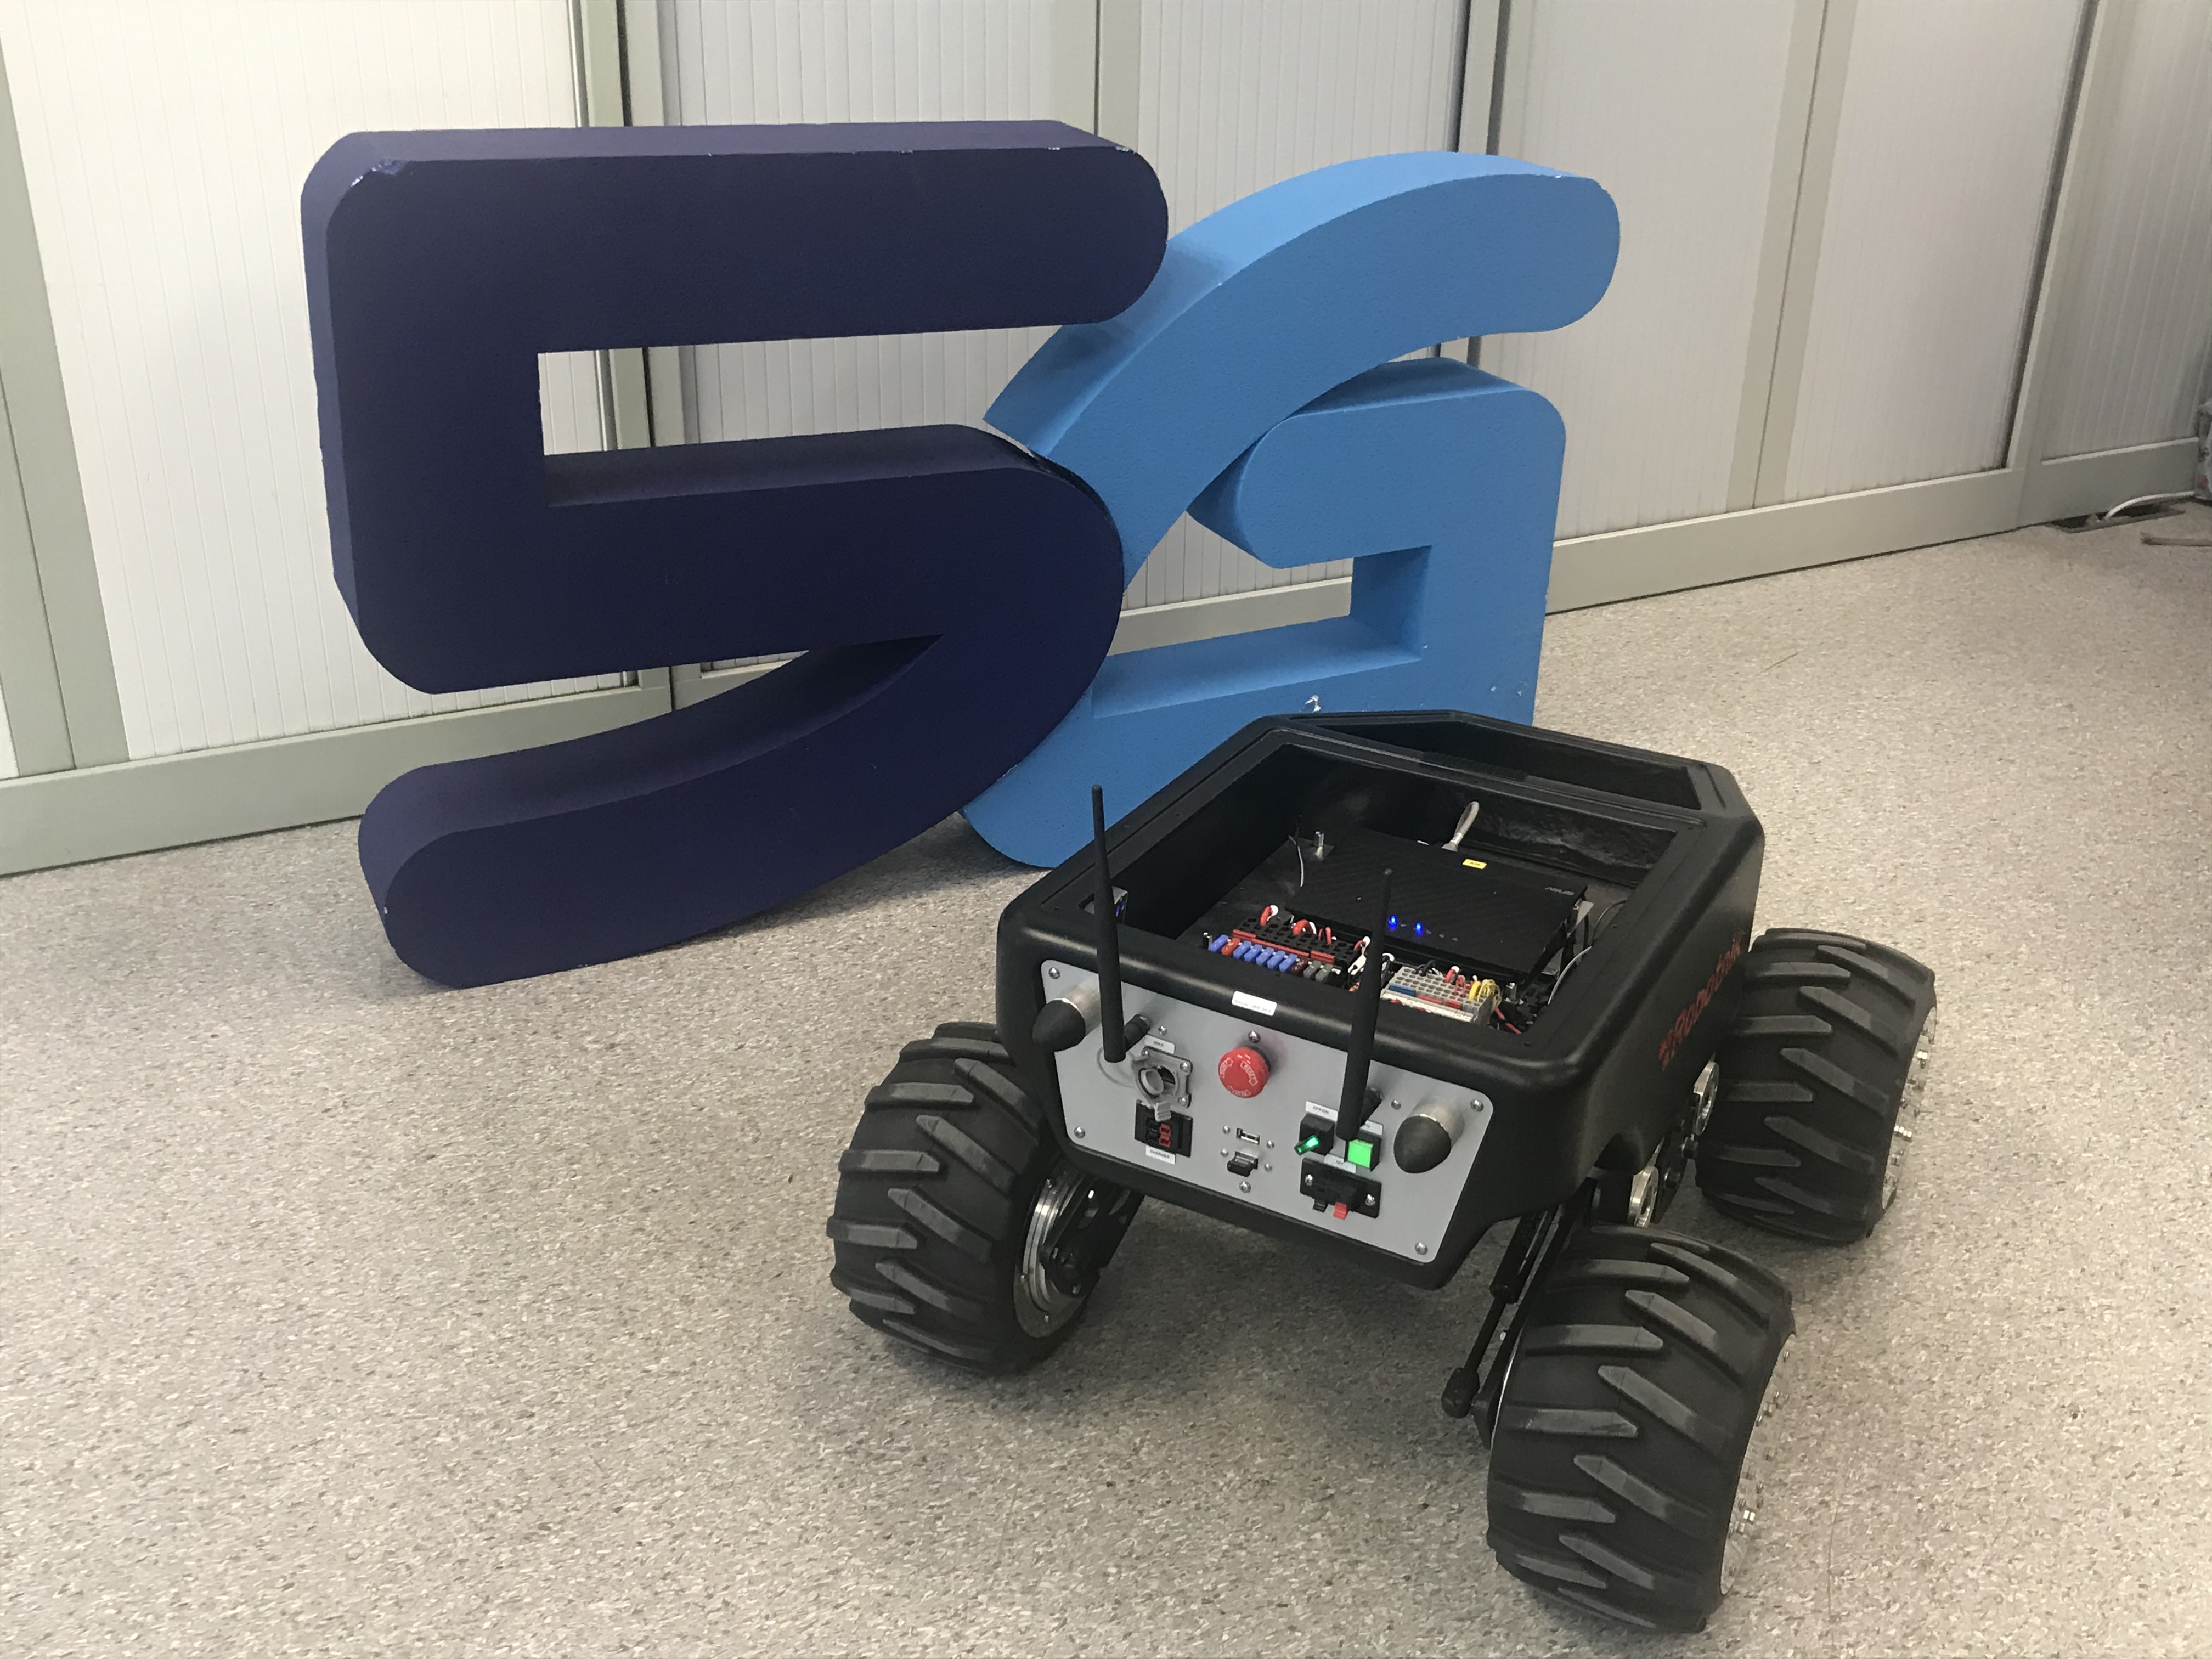 5G Fivecomm